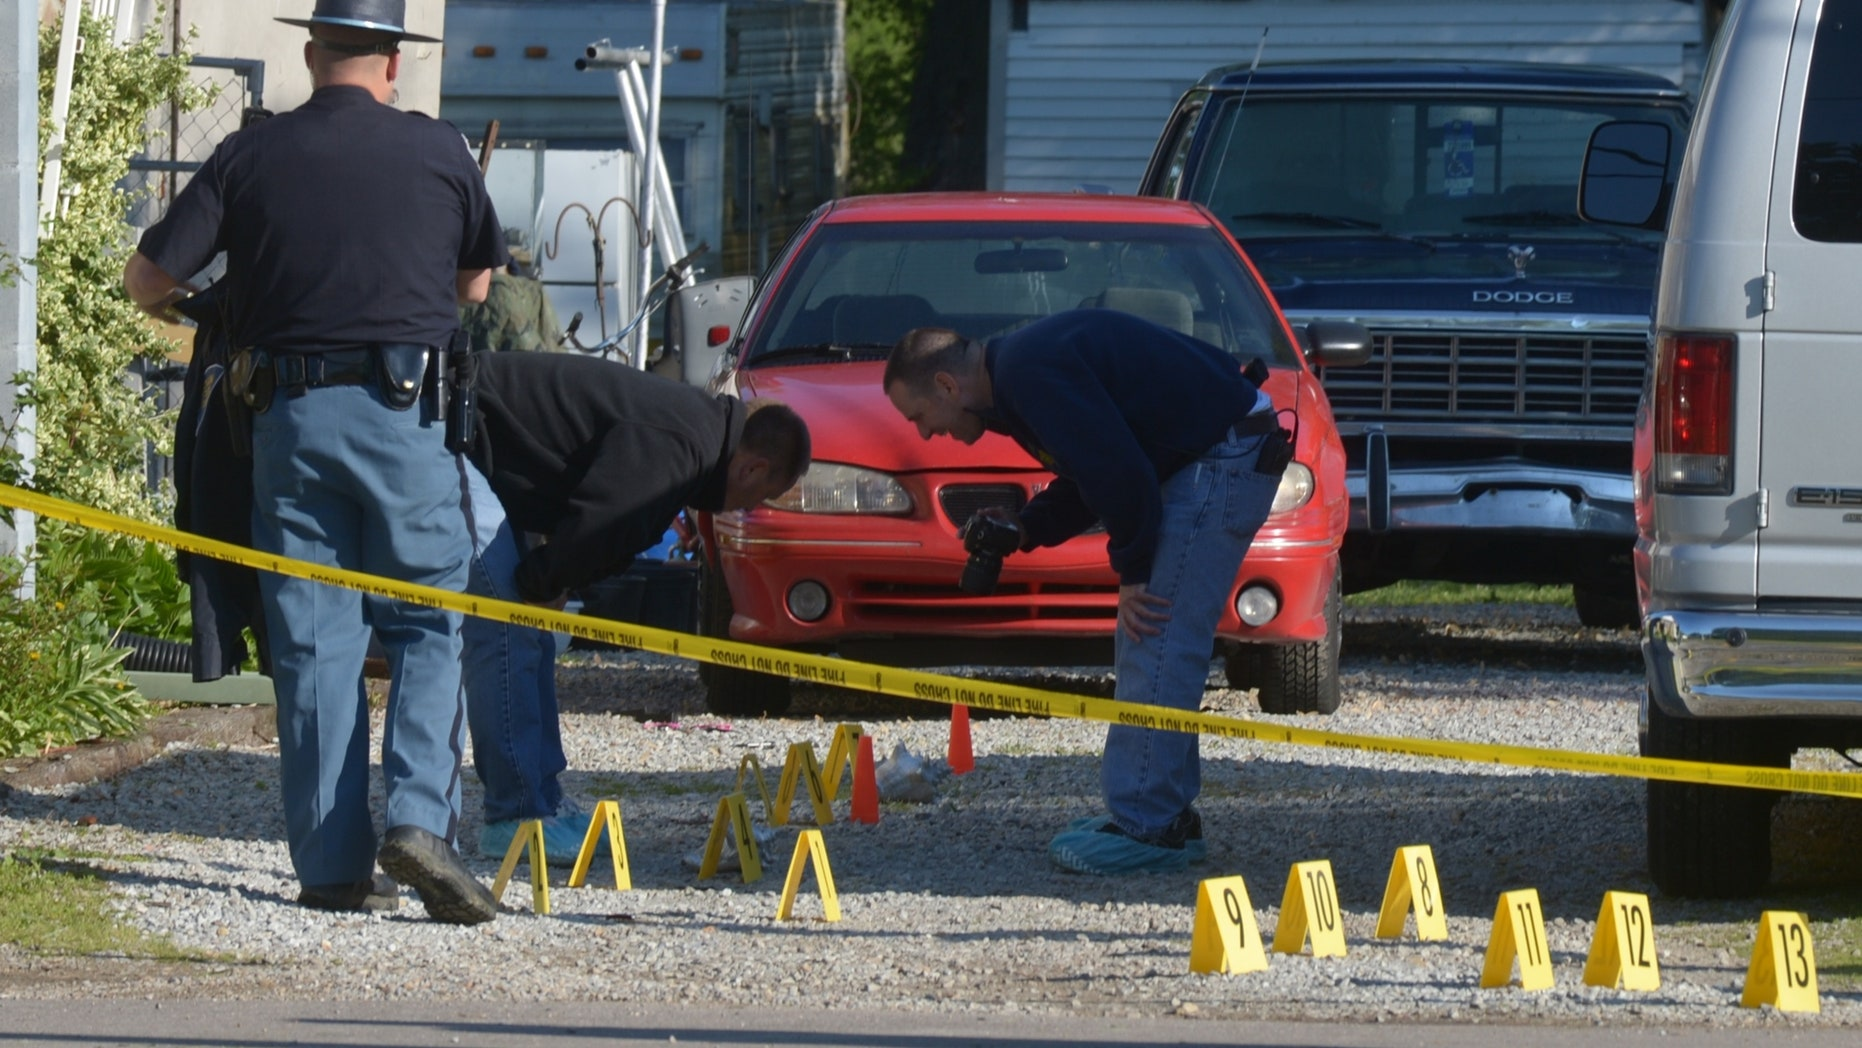 Investigators comb the area in and around 2634 Main Cross Street in Waynesville, Ind., Sunday, May 12, 2012, the scene of a quadruple homicide overnight. (AP Photo/The Republic, Joe Harpring)